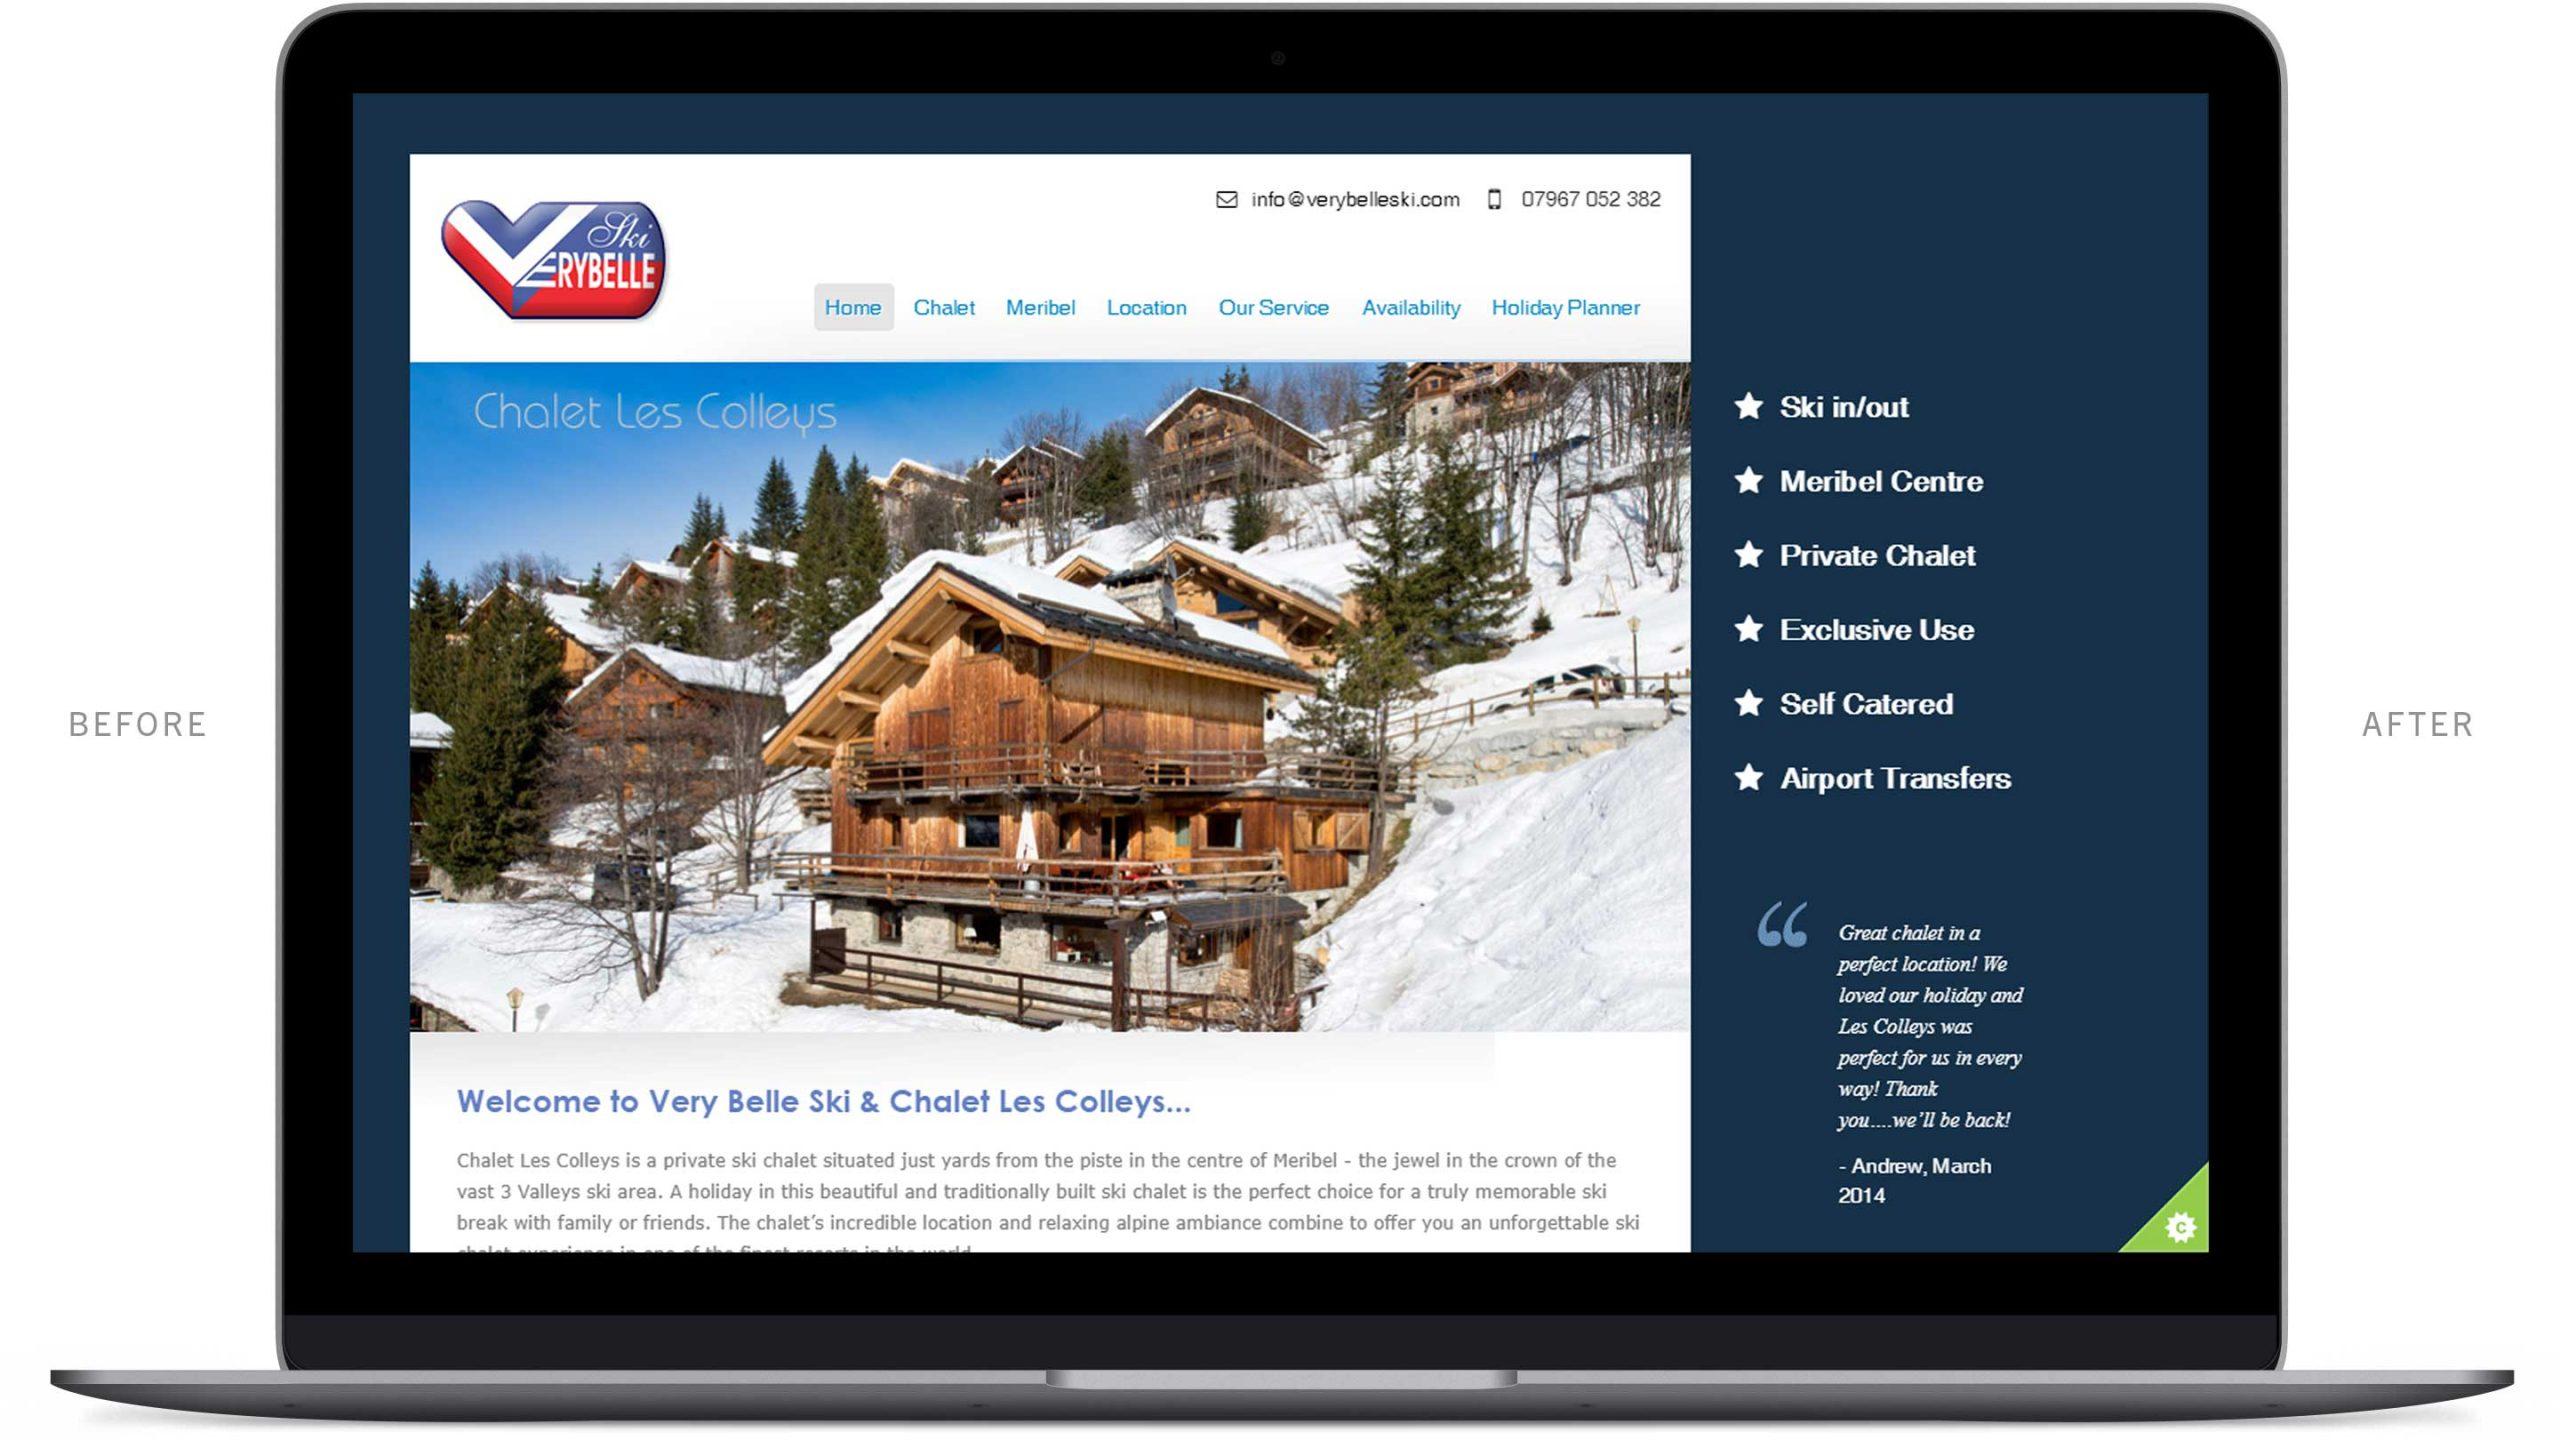 chalet in meribel website before